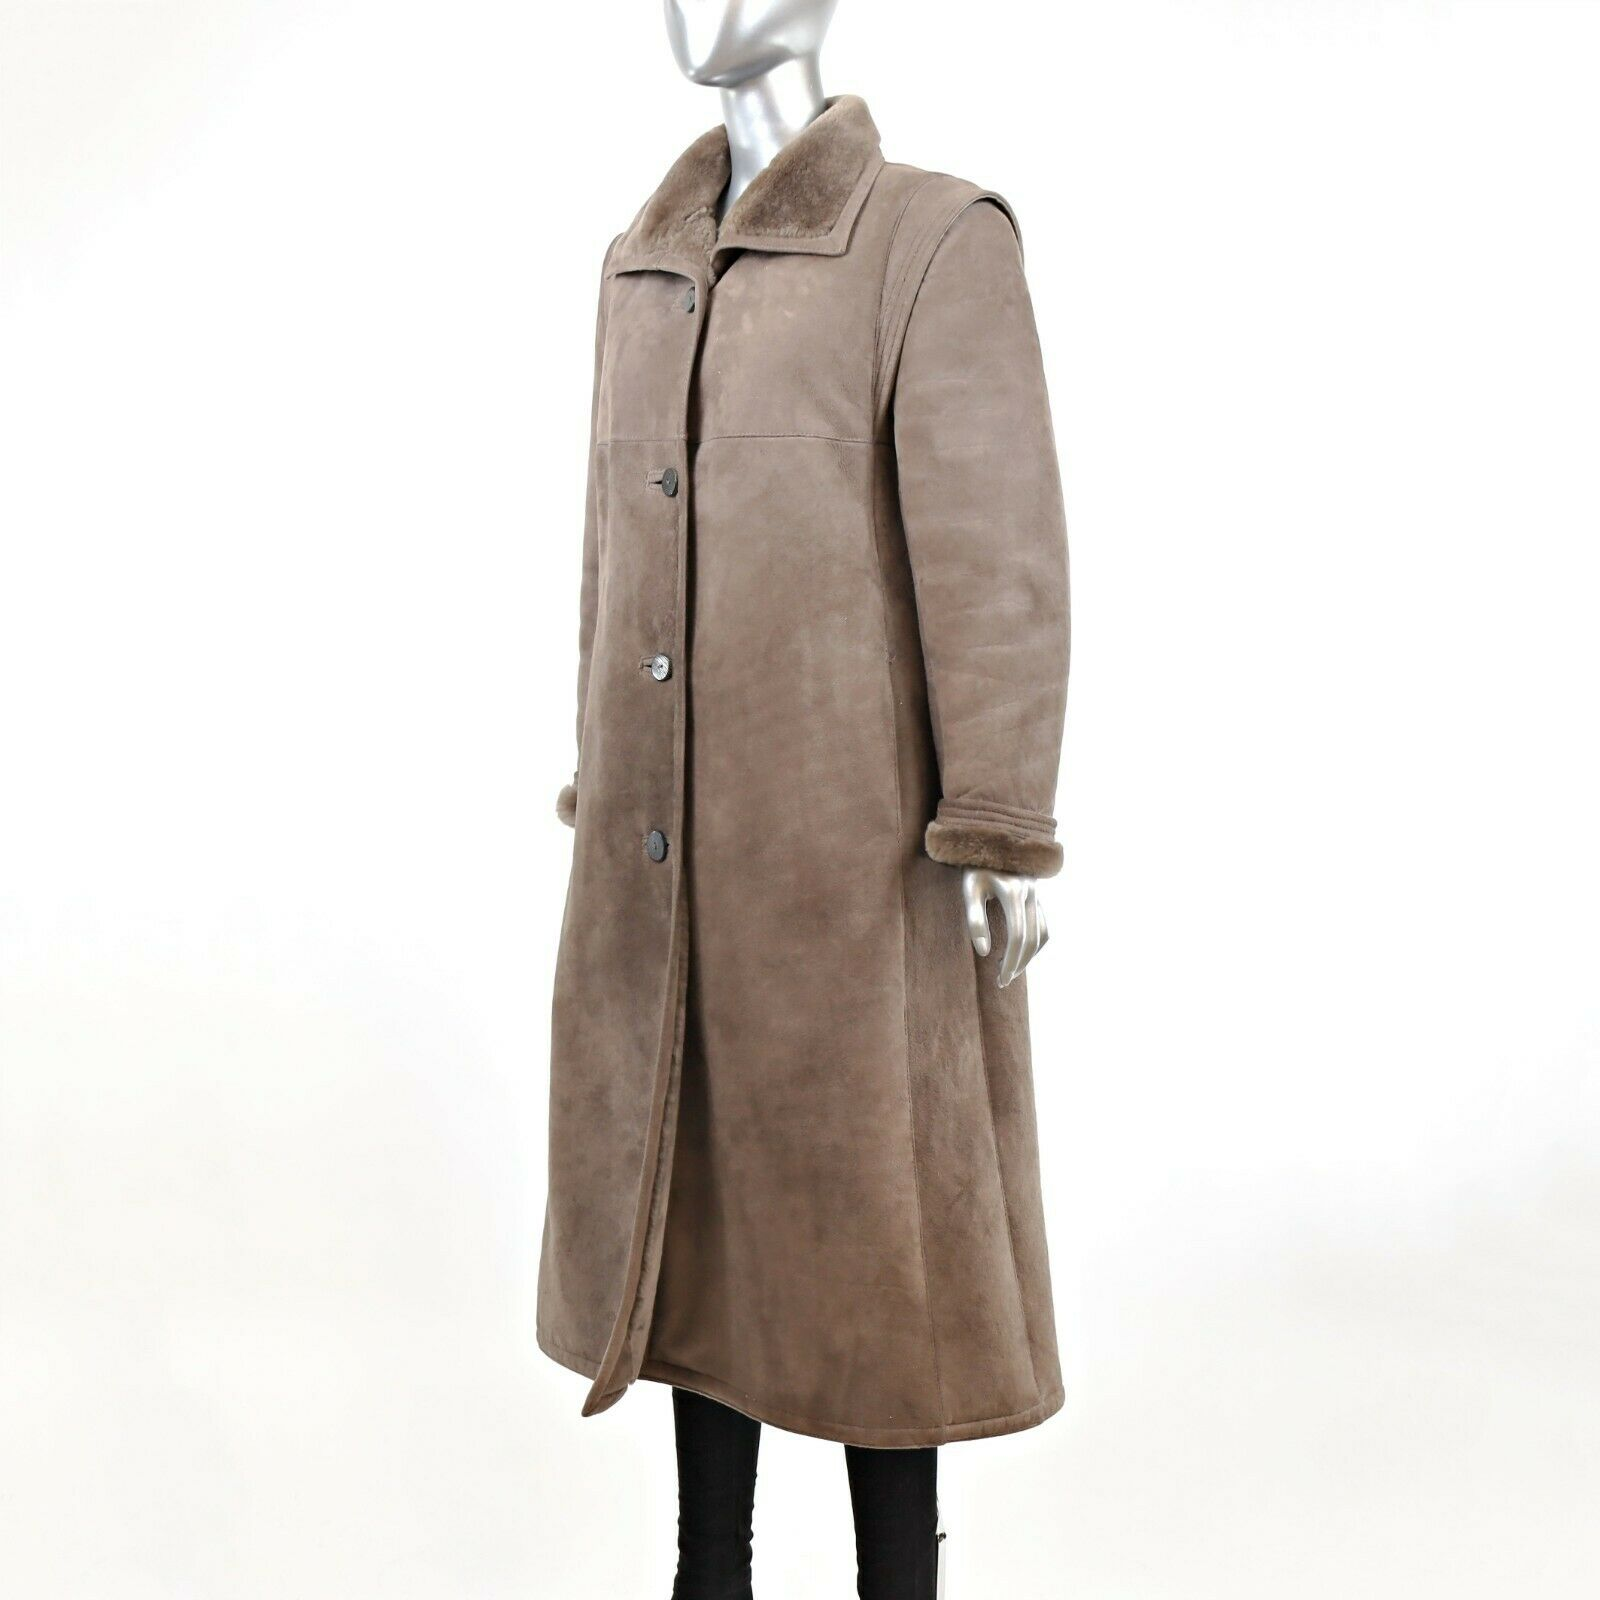 Full Length Shearling Coat- Size M-L (Vintage Fur… - image 2